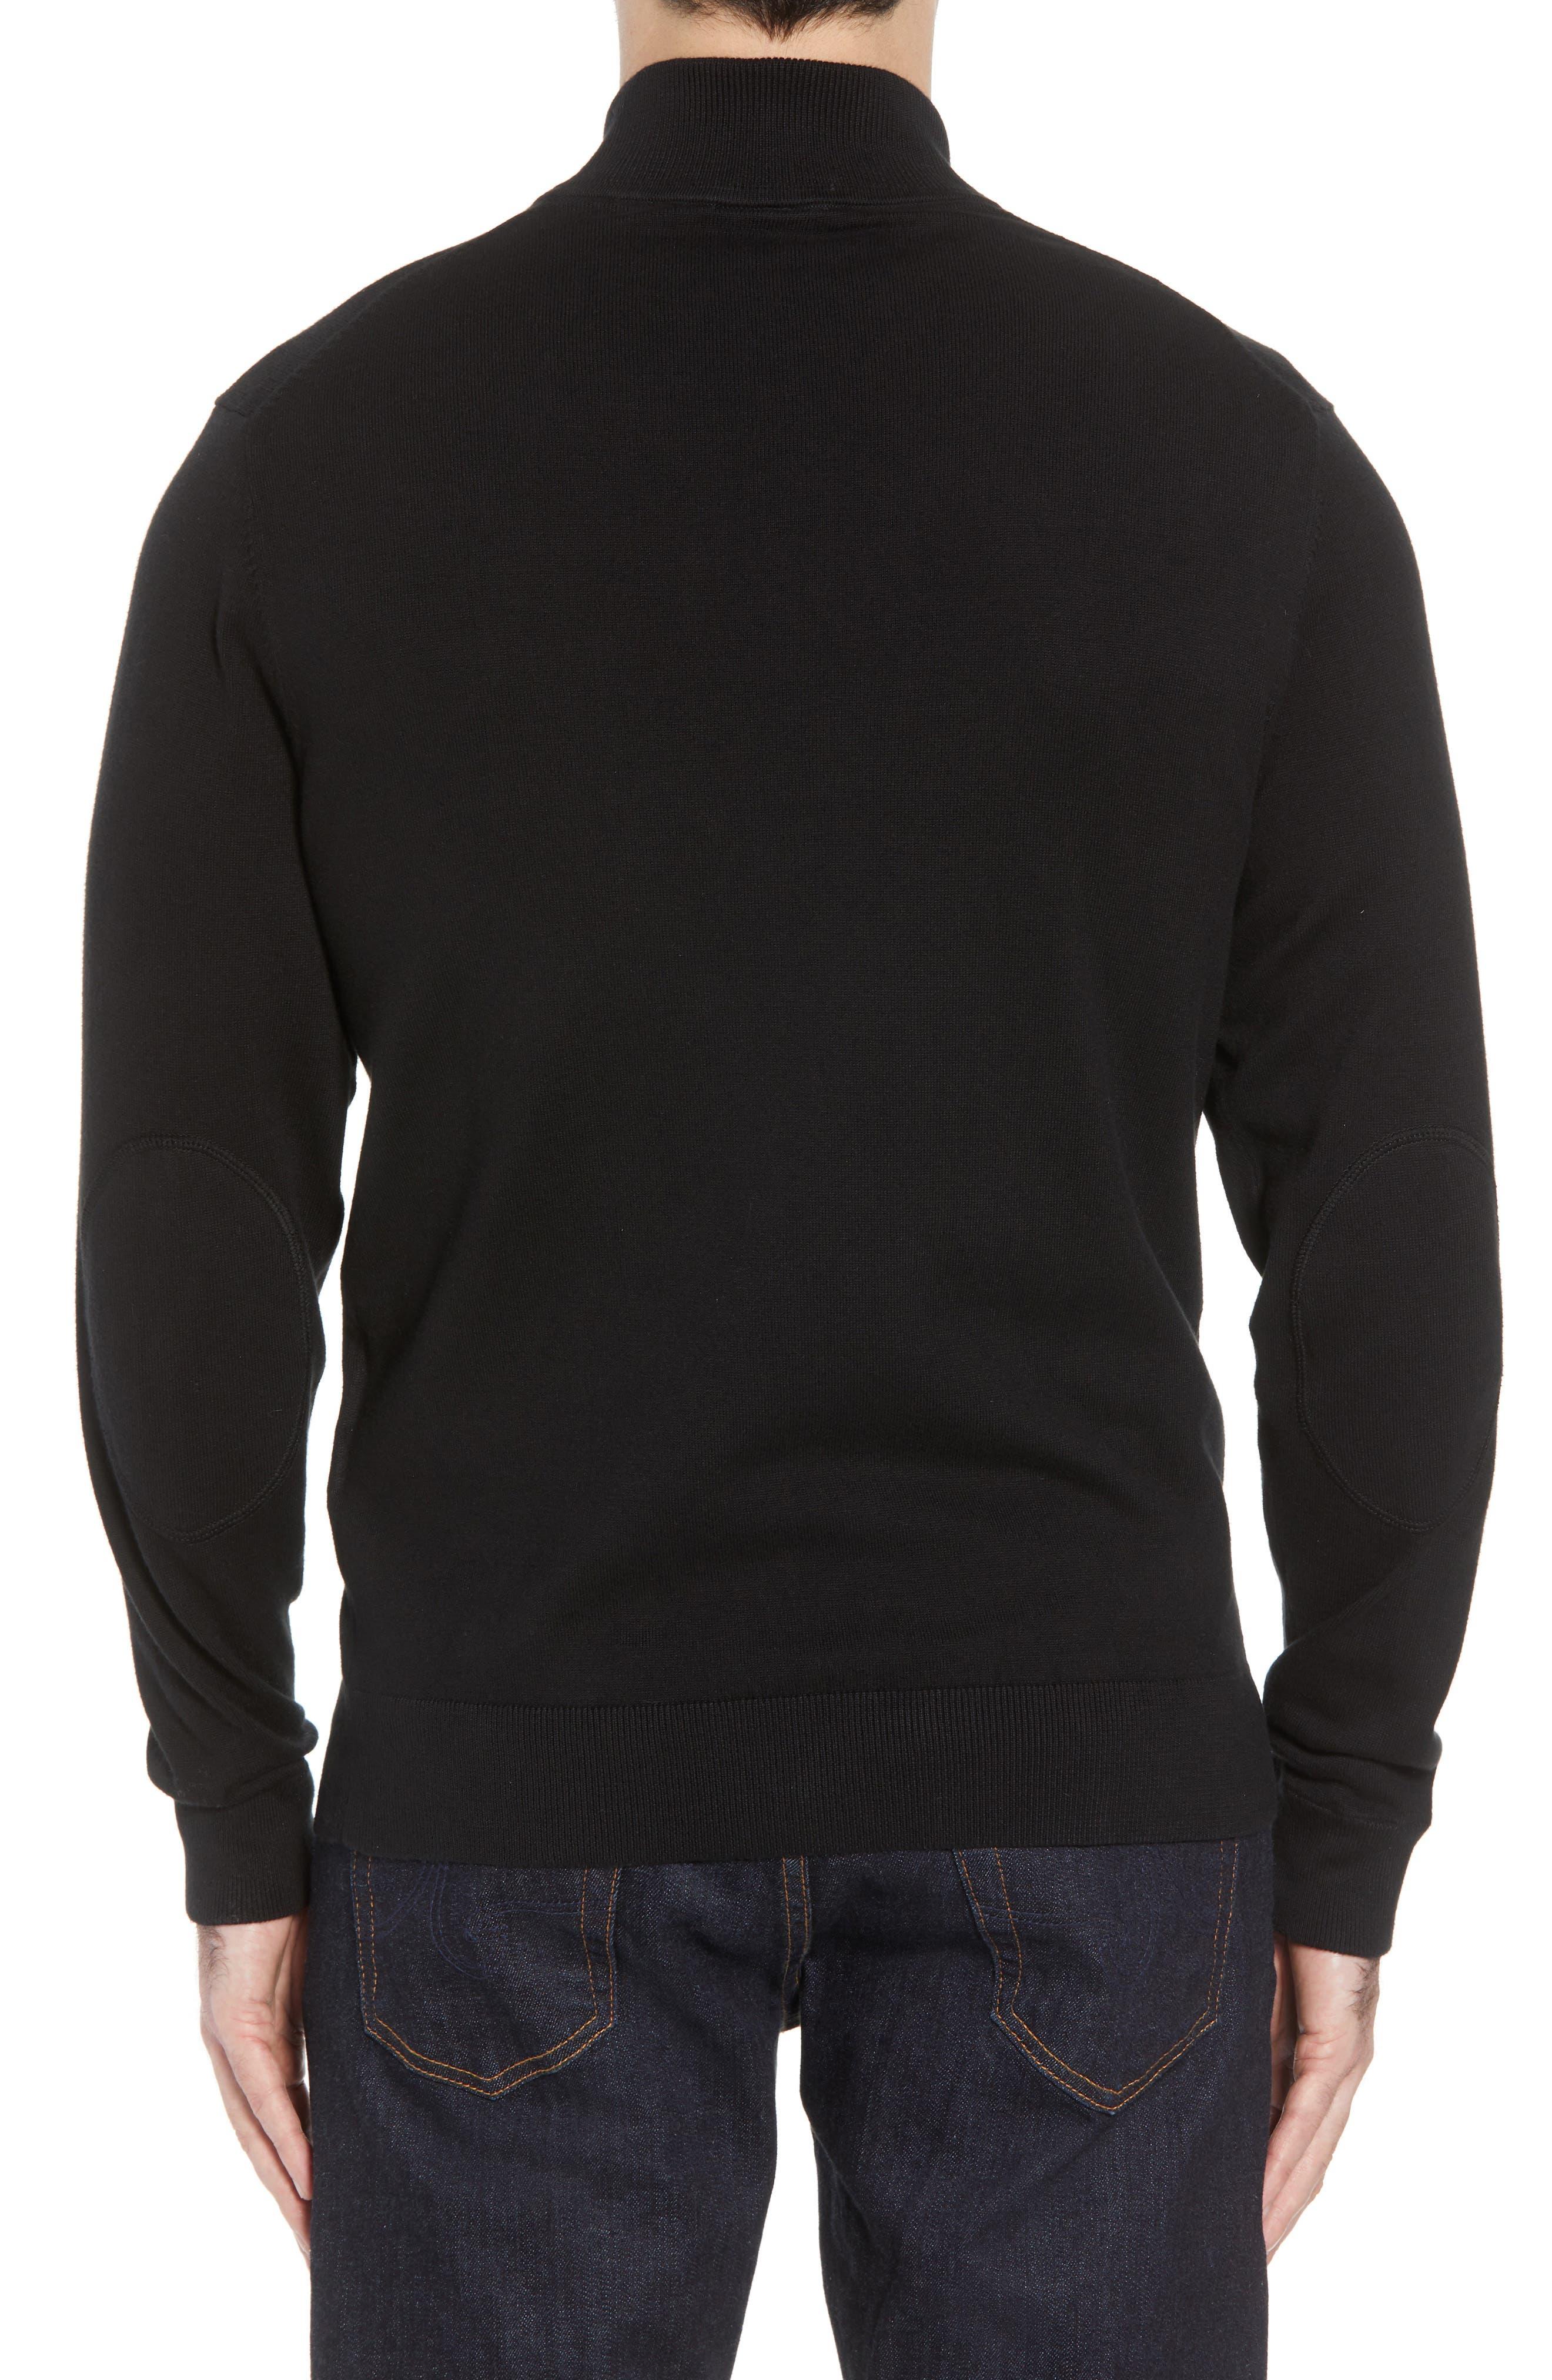 Baltimore Ravens - Lakemont Regular Fit Quarter Zip Sweater,                             Alternate thumbnail 2, color,                             BLACK